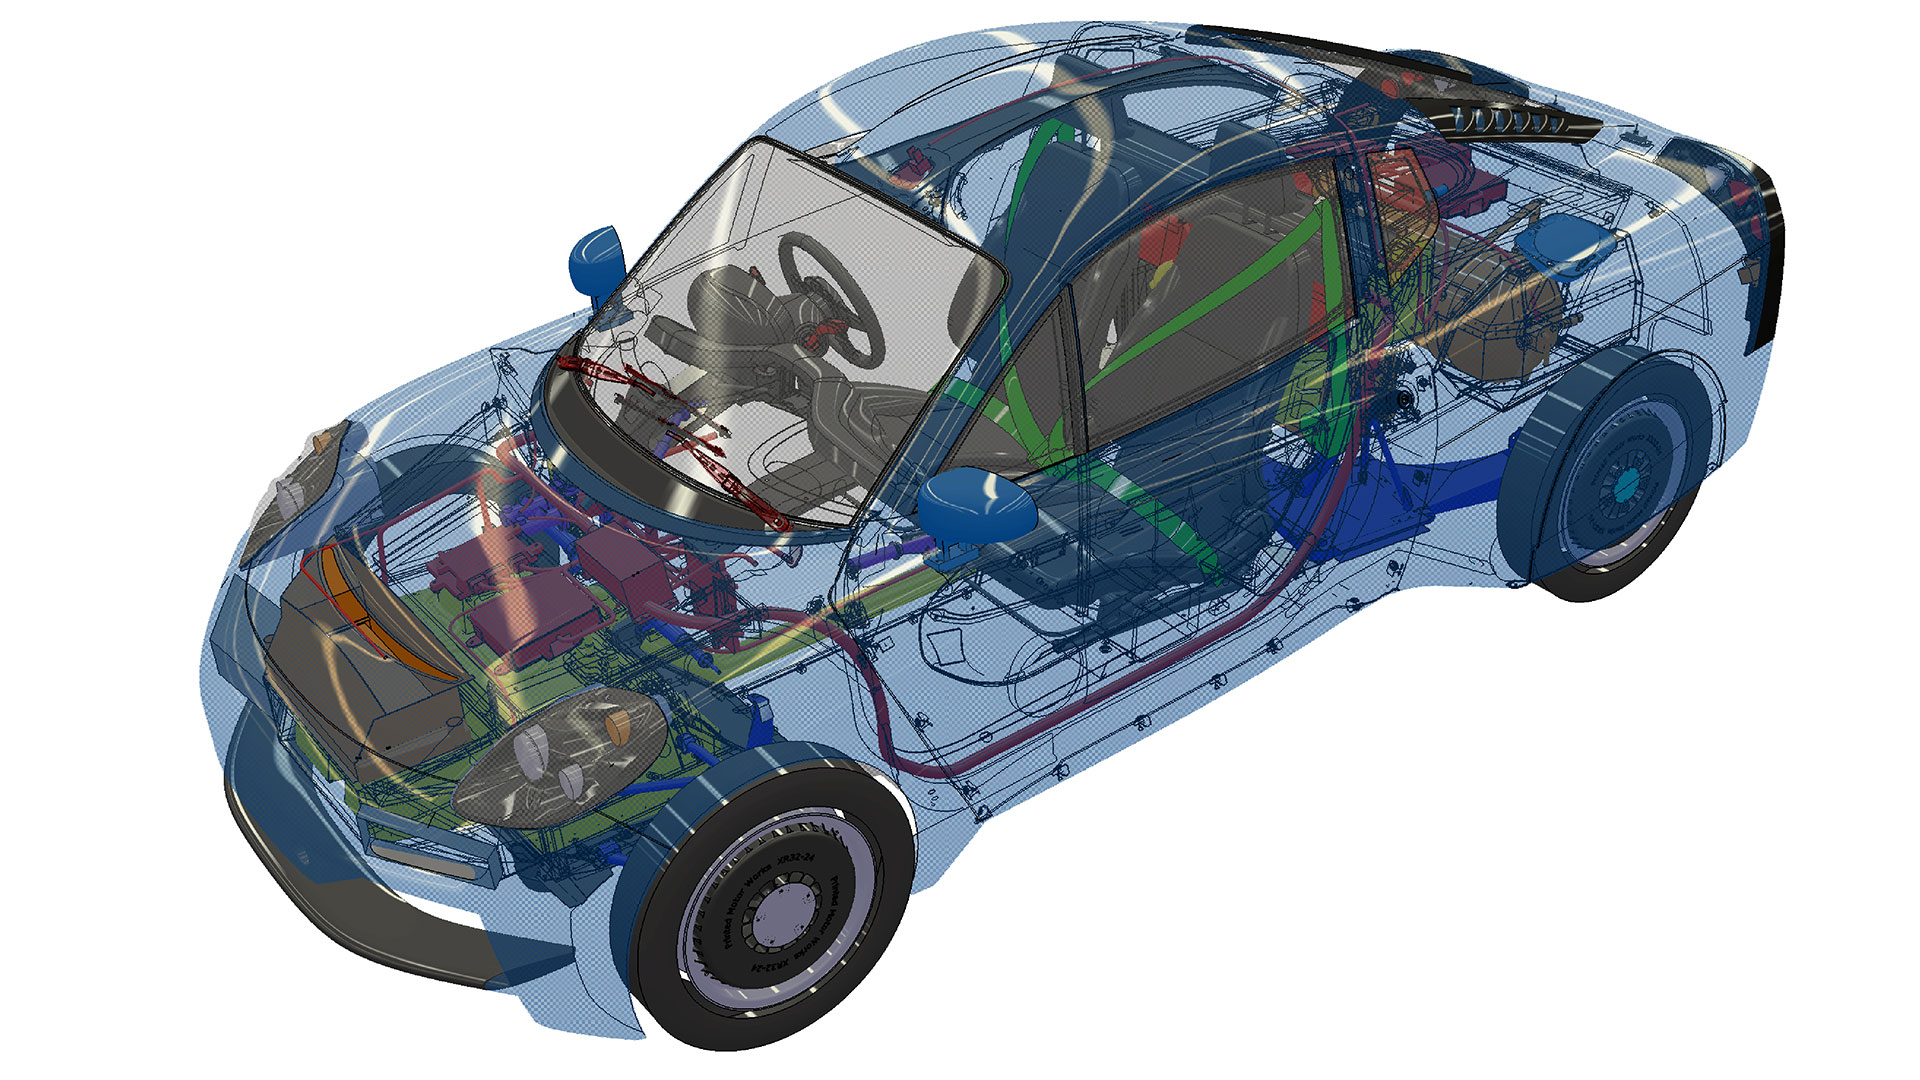 「CAD」の画像検索結果